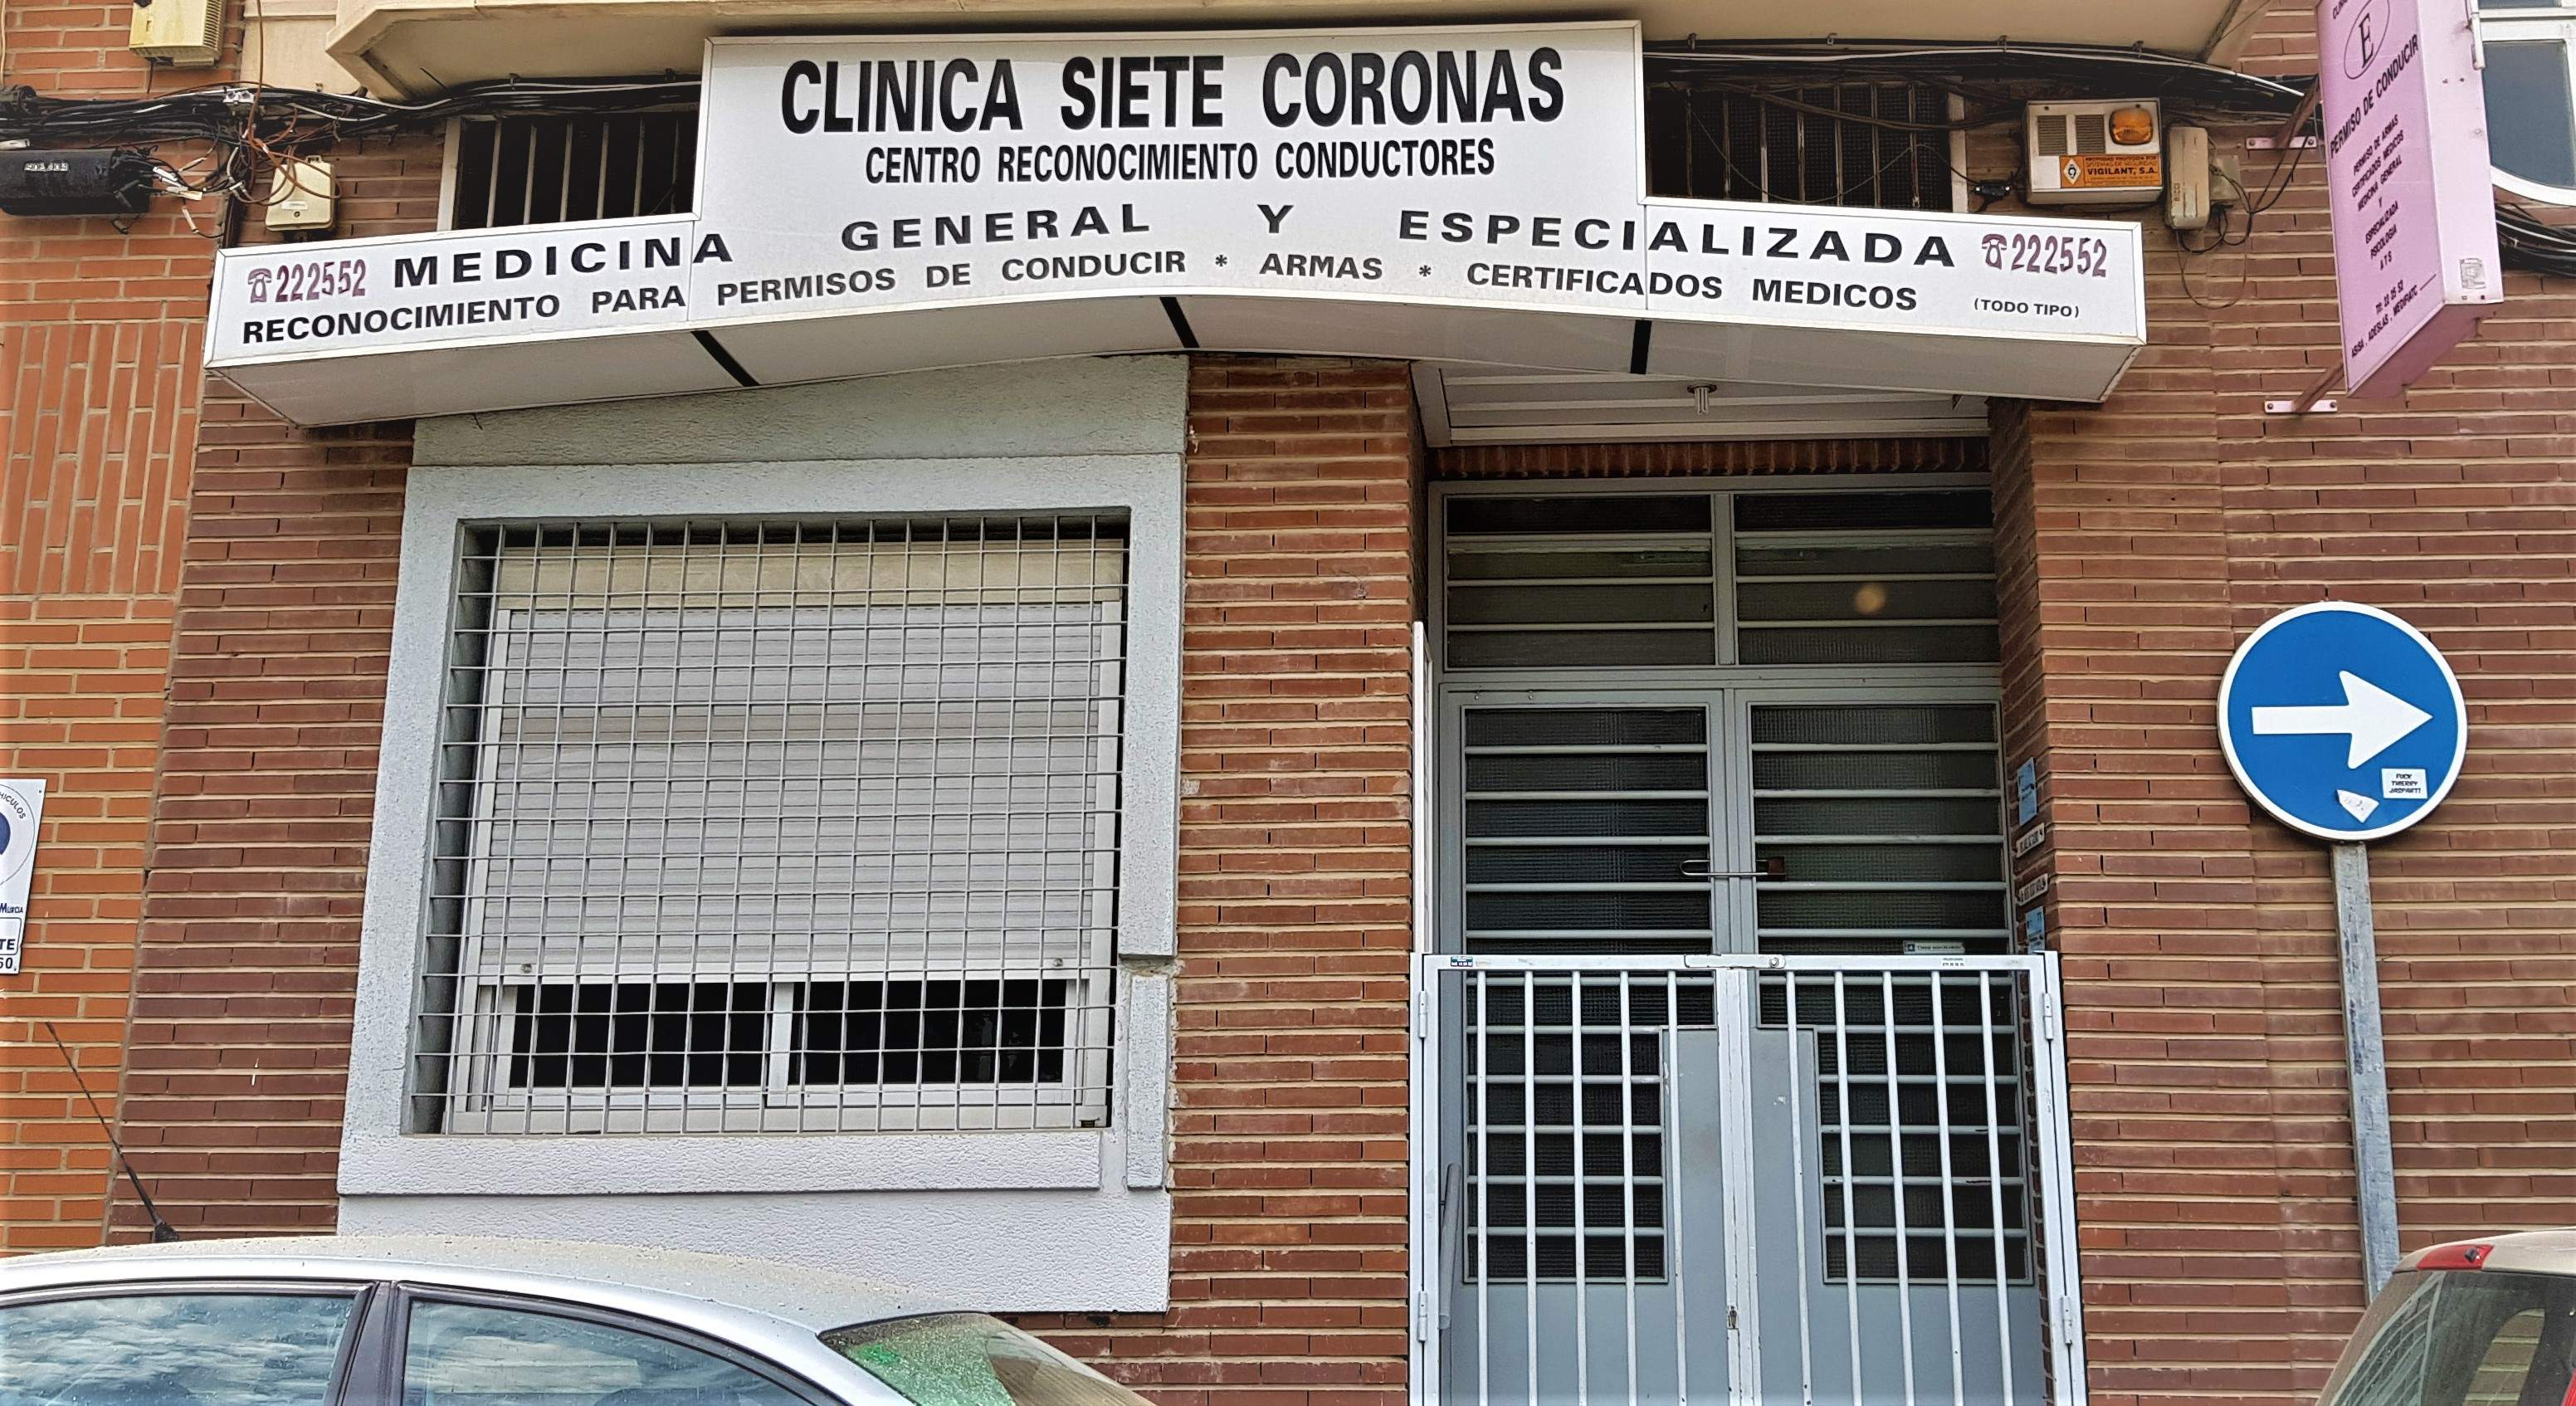 Clinica Siete Coronas